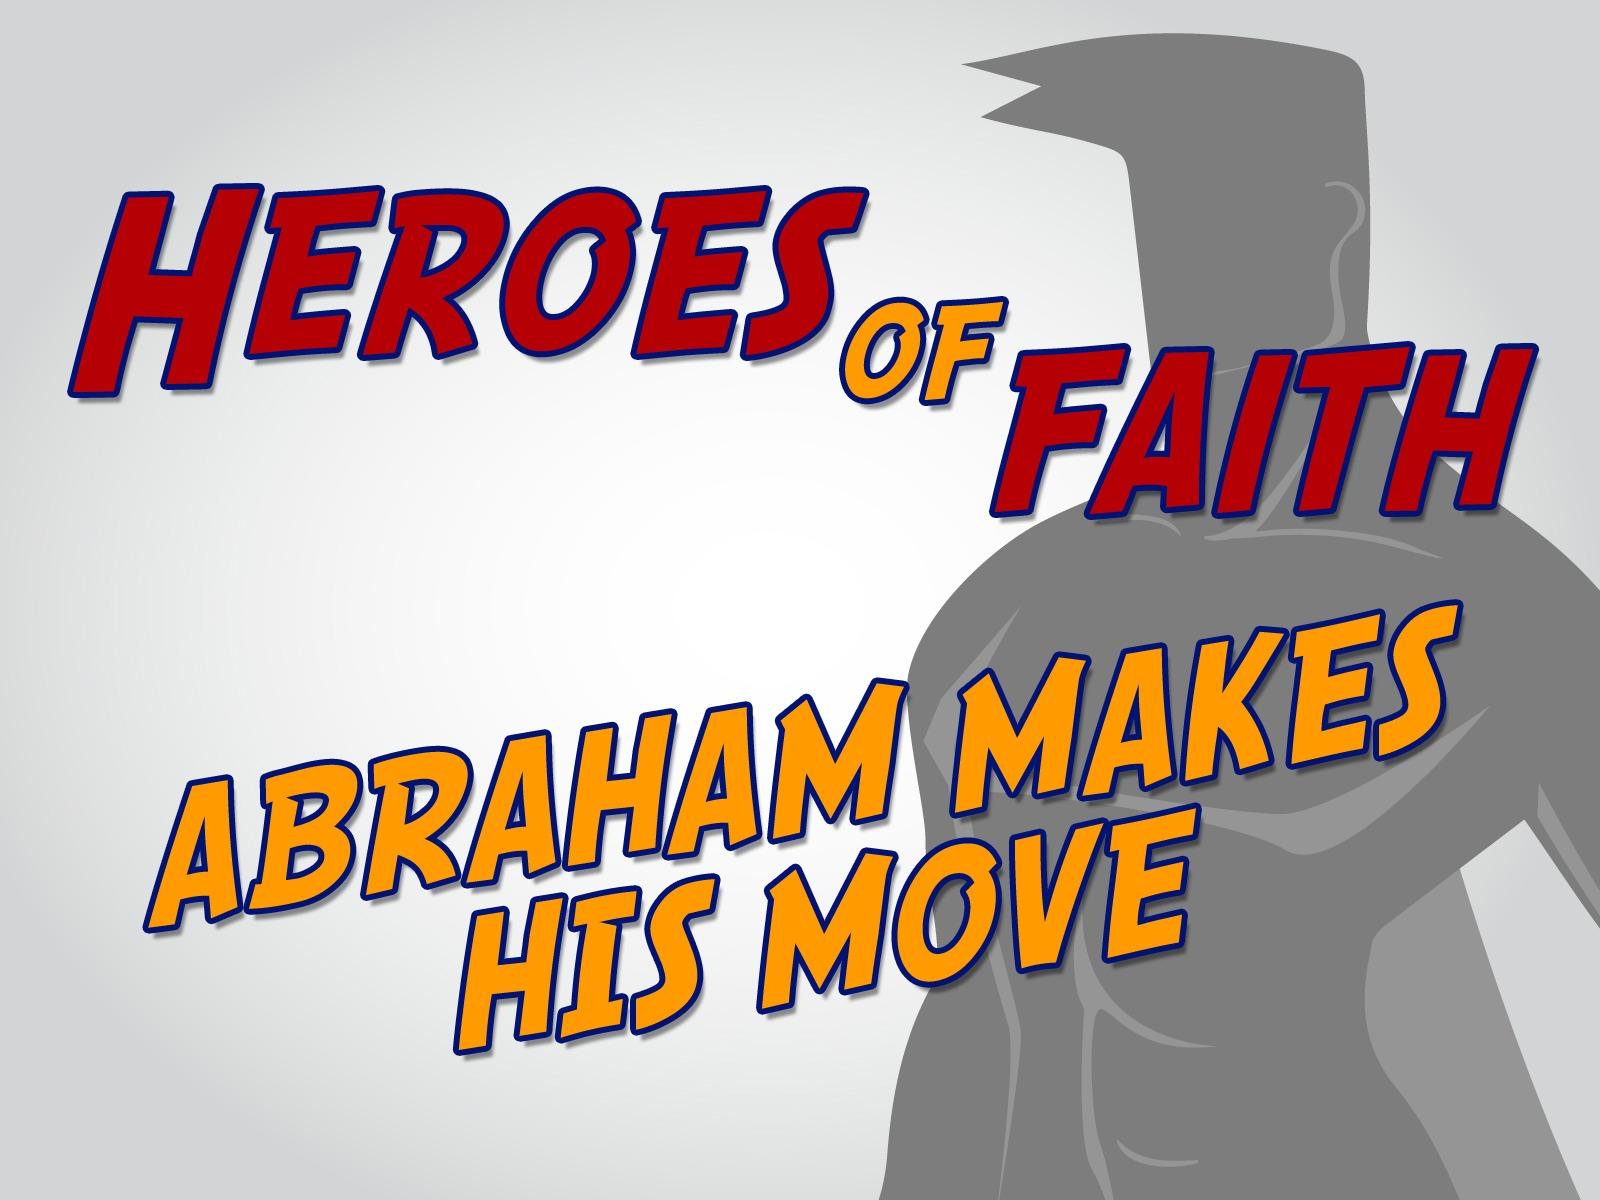 u0027Abraham Makes His Moveu0027 Childrenu0027s Lesson on Abrahamu0027s Call  sc 1 st  MinistryArk & Abraham Makes His Moveu0027 Childrenu0027s Lesson on Abrahamu0027s Call ...